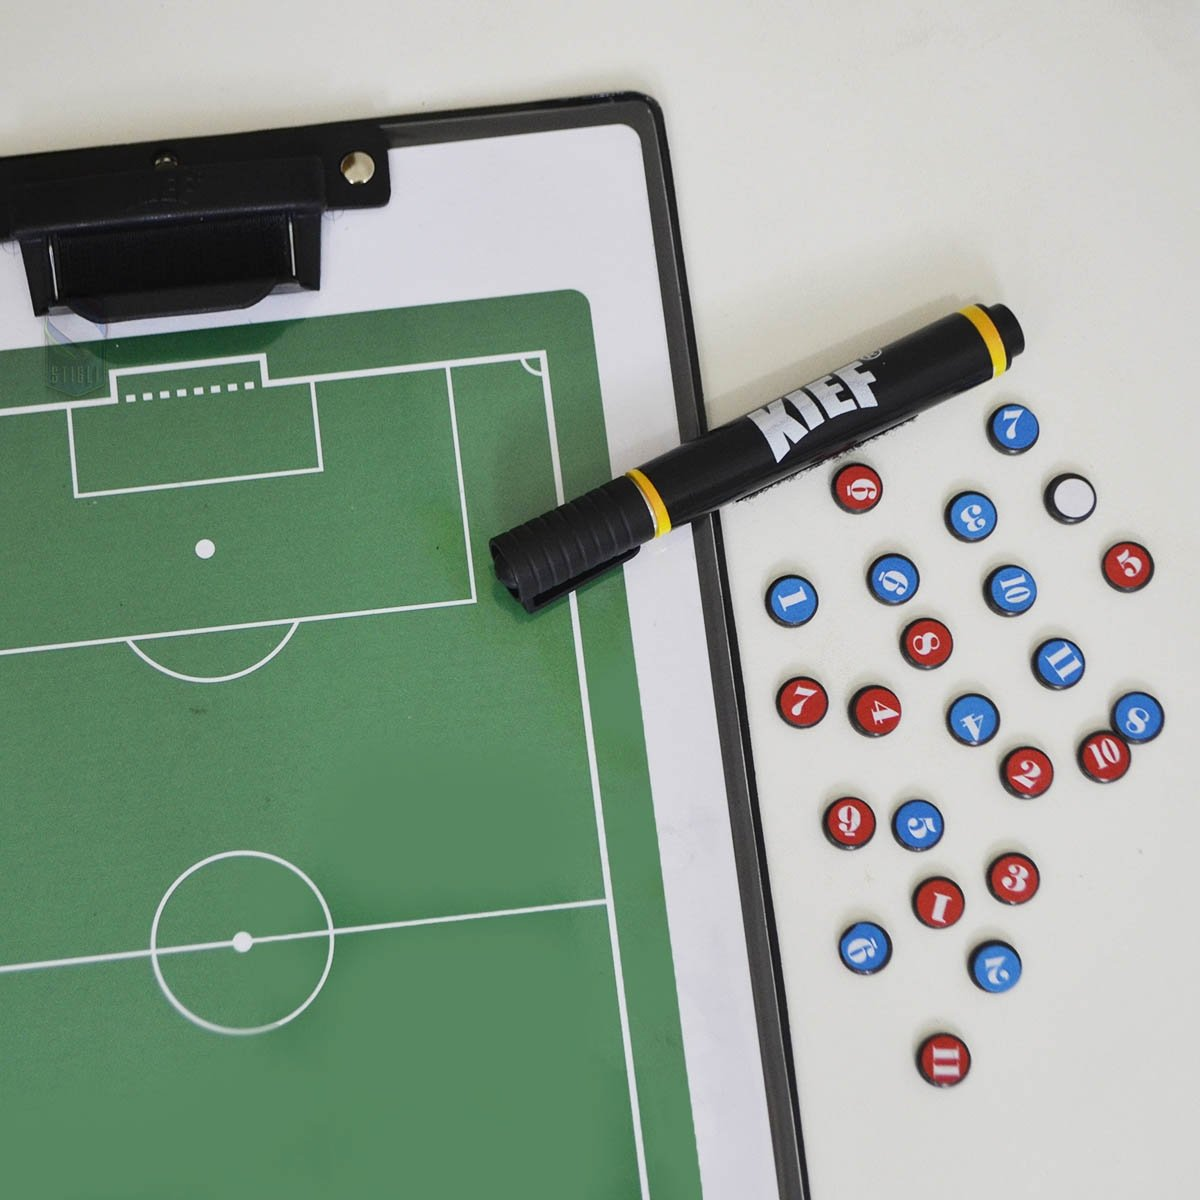 5322732faa Prancheta Tática Magnética Futebol De Campo Kief Imã  Caneta - Verde ...